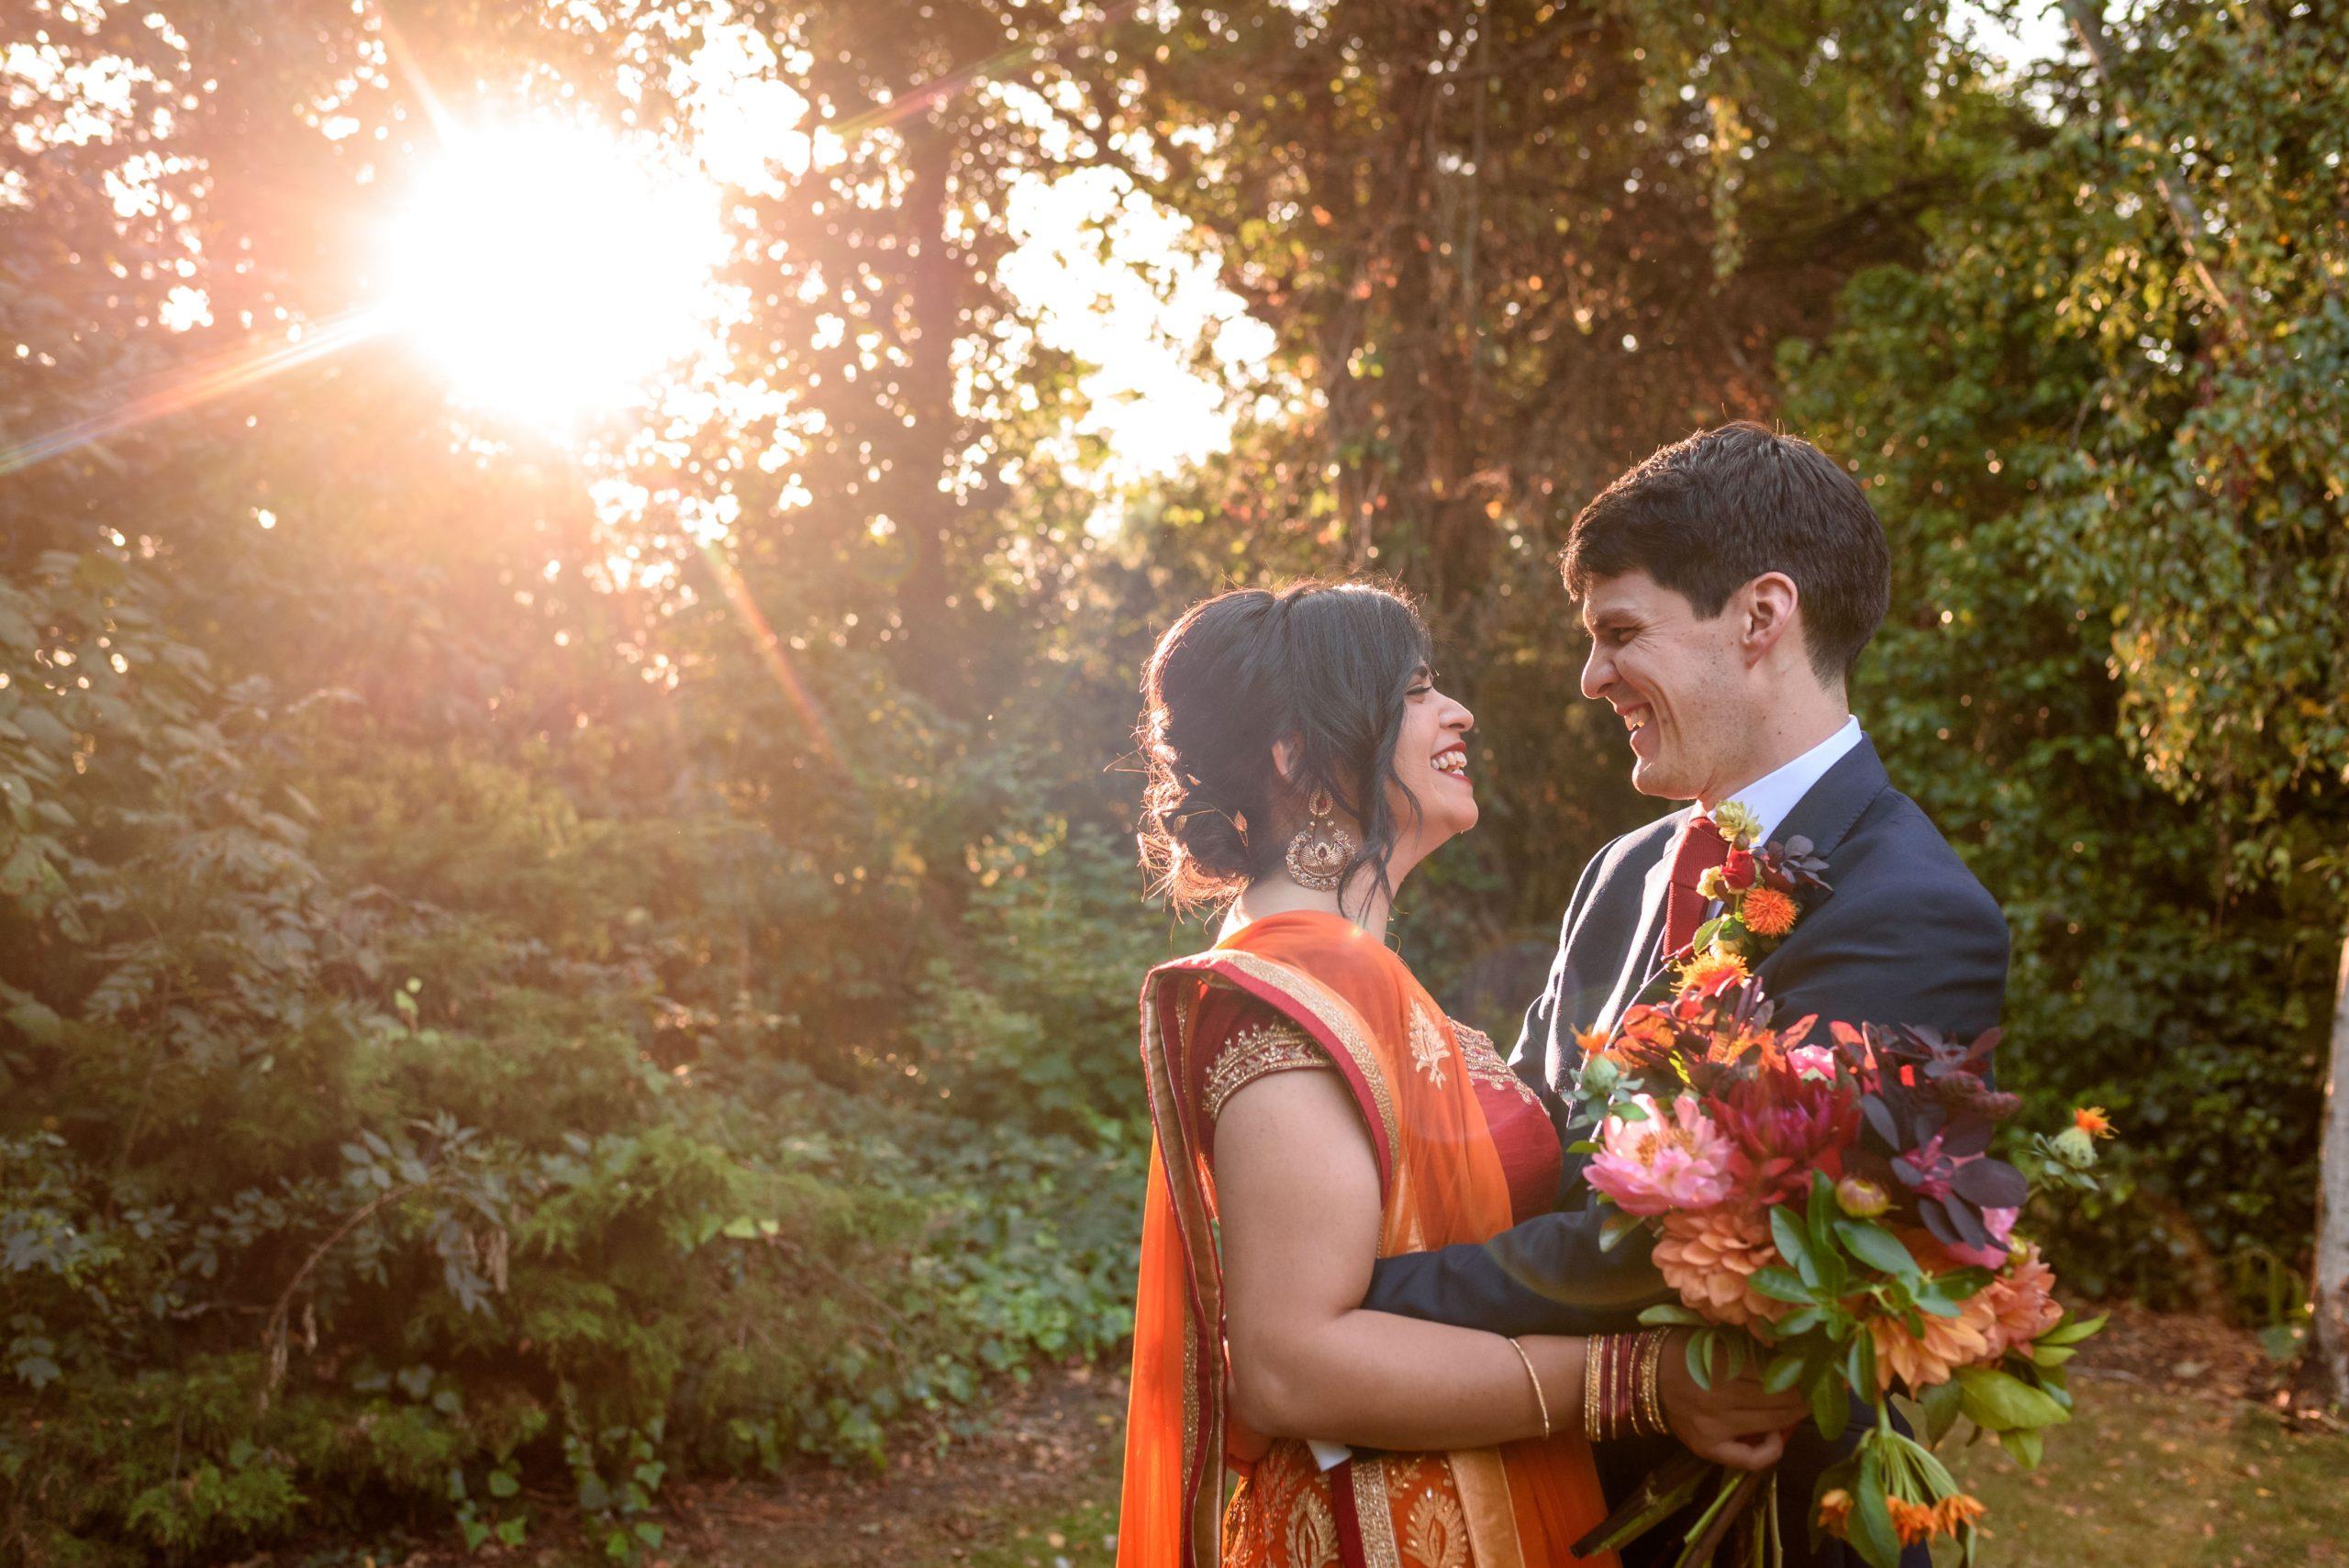 wedding couple taking photos in Peckham Rye Park